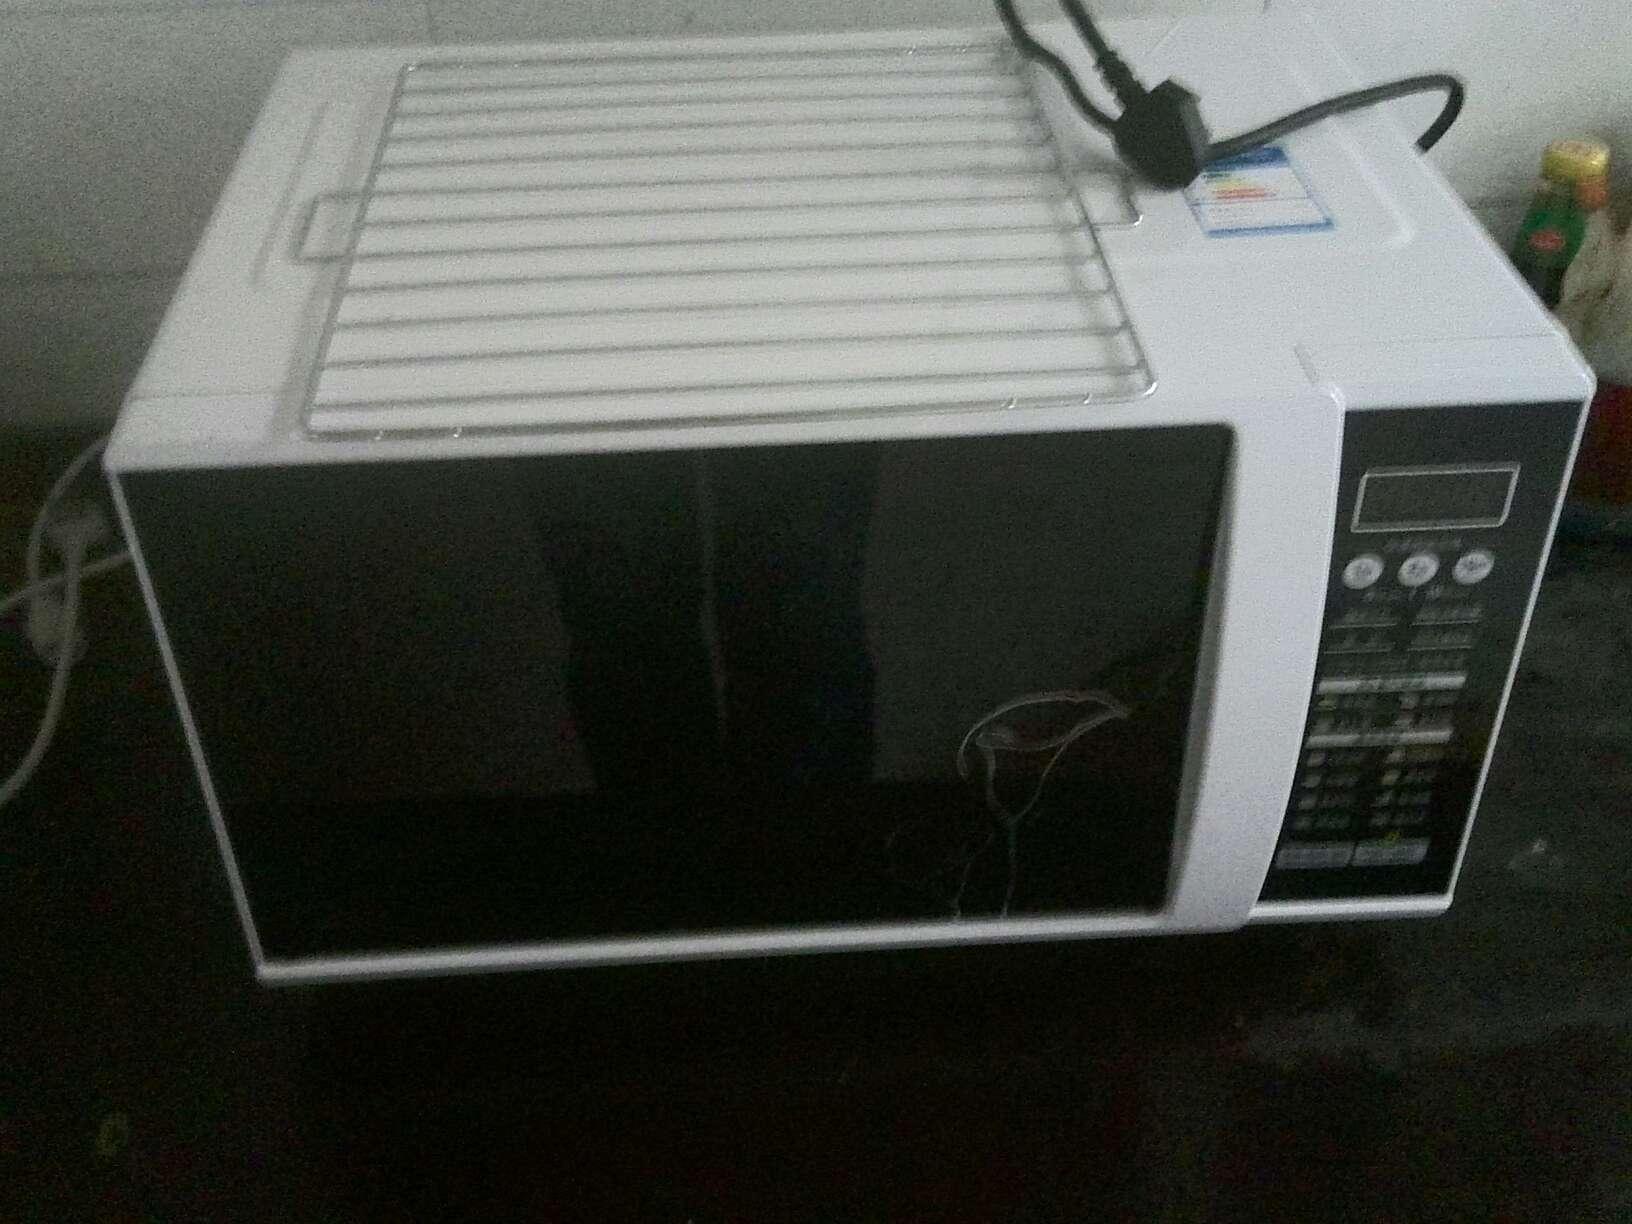 acics tiger 00222065 for-cheap